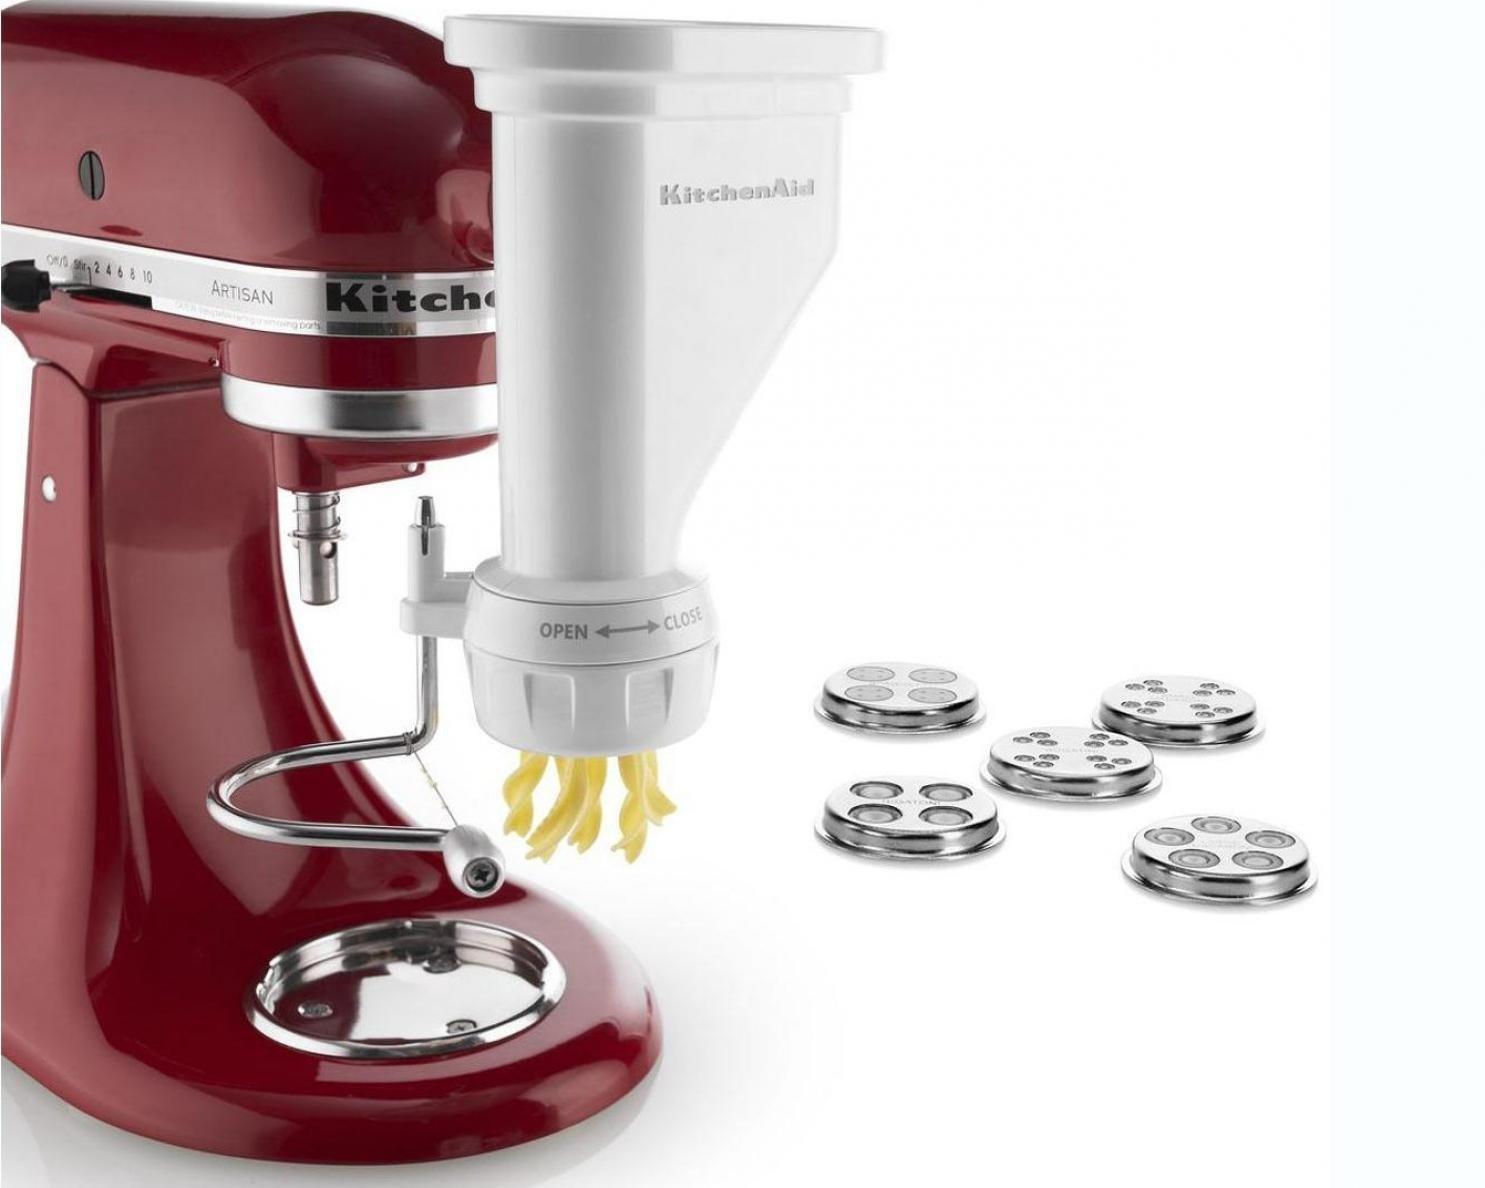 20 Amazing Kitchen Aid Mixer Attachments